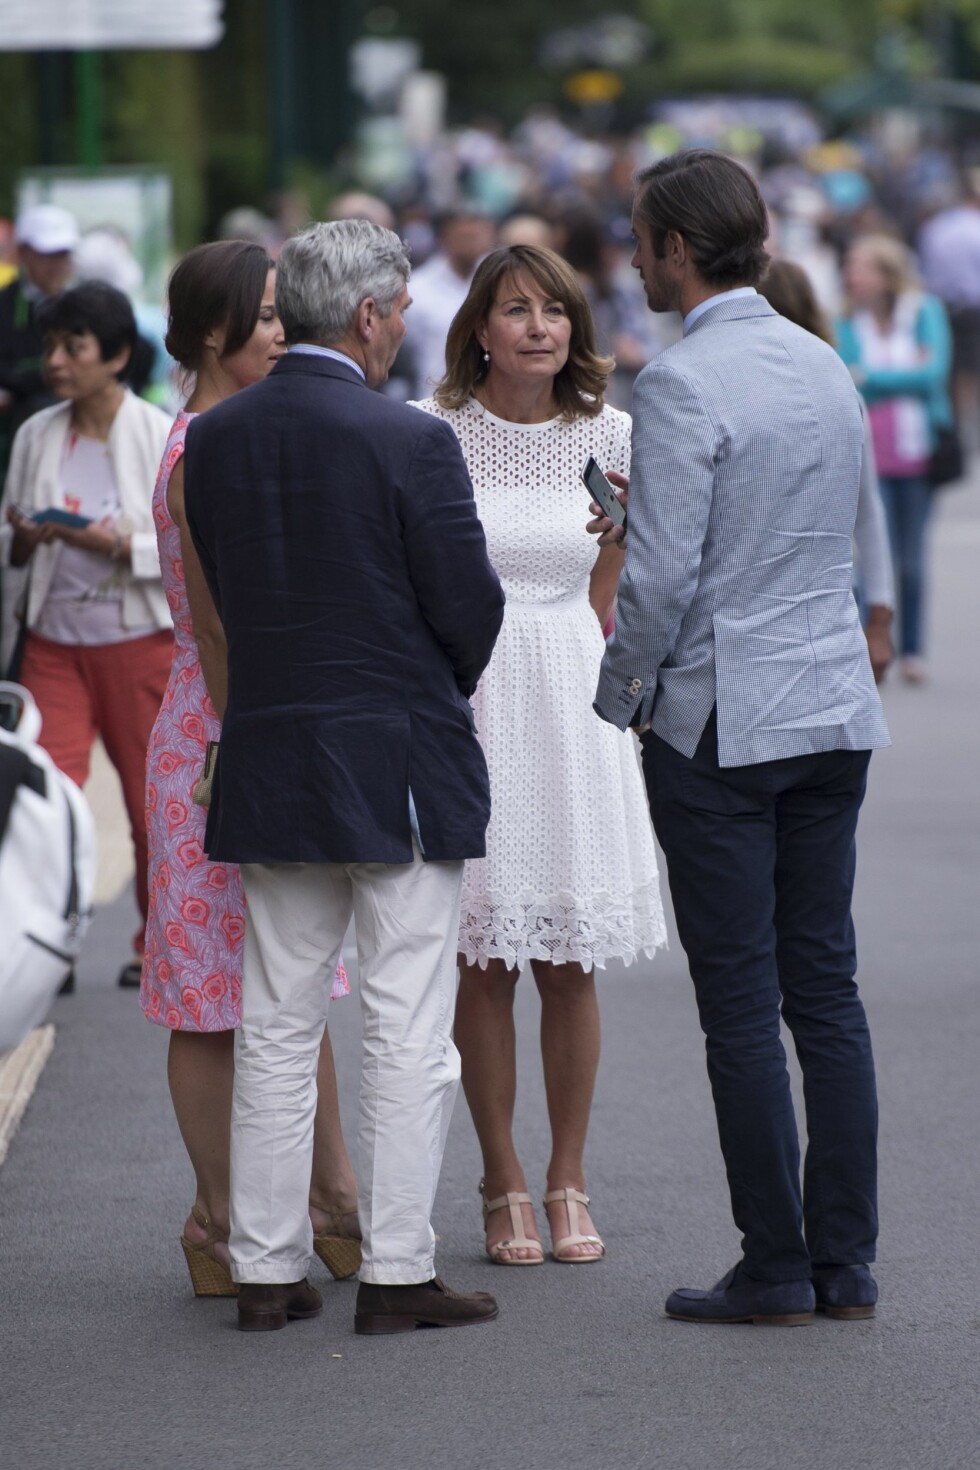 INNE I VARMEN: Også Pippas foreldre Michael og Carole Middleton var med kjærrsteparet på Wimbledon den 6. juli. Her står Middletons sammen med Pippas ferske forlovede James Matthews (t.h).  Foto: Xposure